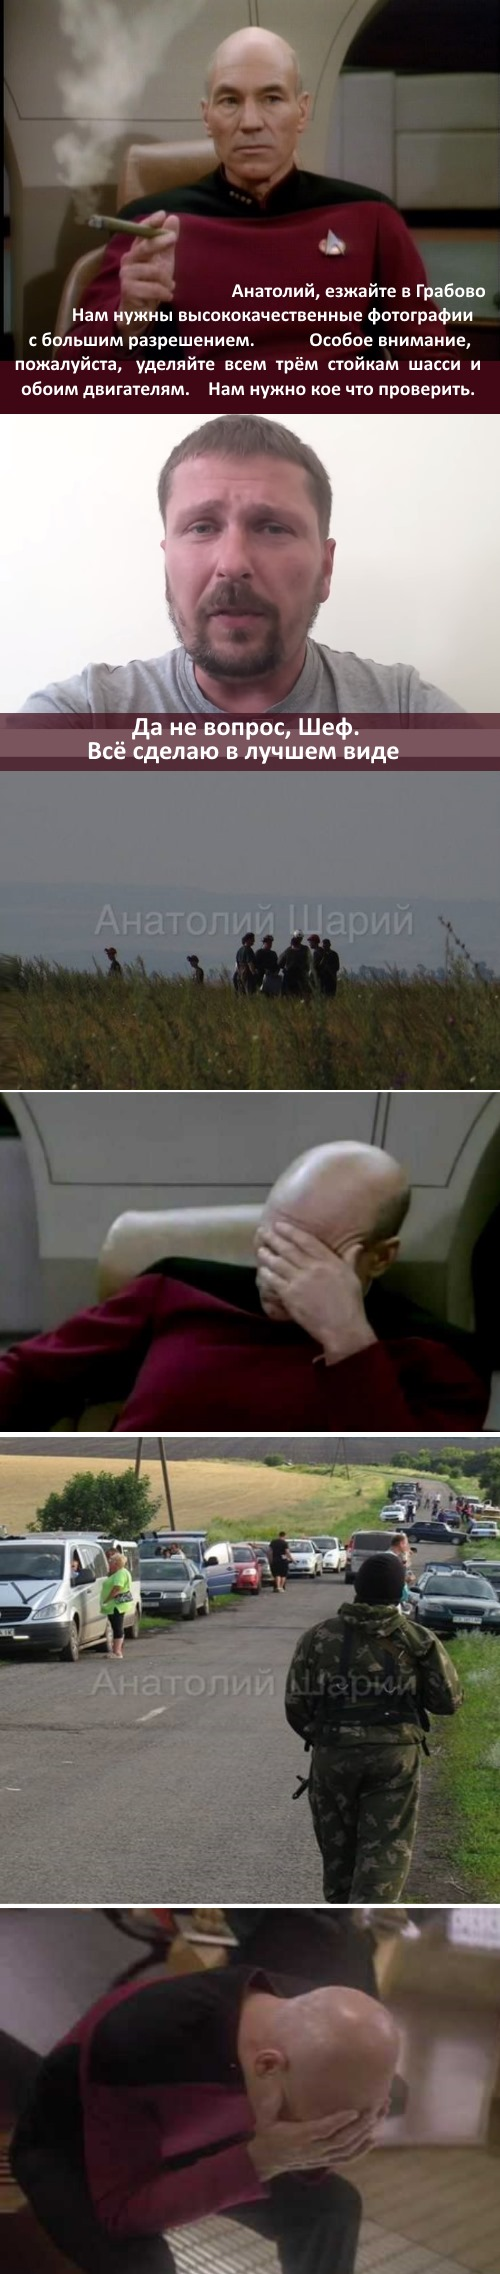 http://images.vfl.ru/ii/1407449496/84776a9f/5930255.jpg